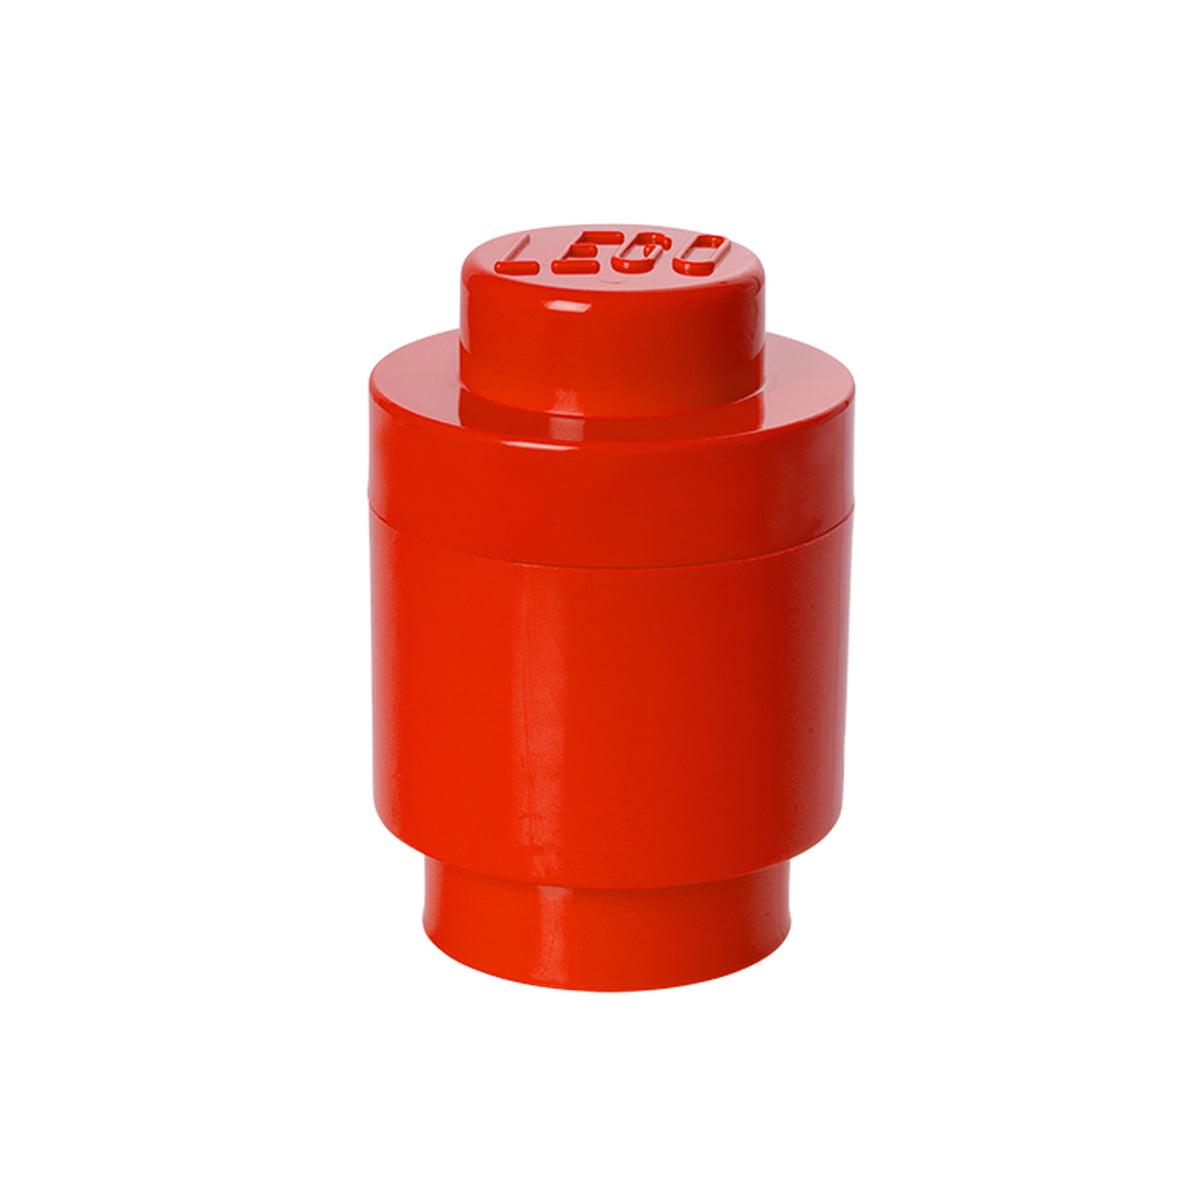 Lego - Storage Brick 1 Round, rot   Kinderzimmer > Spielzeuge   Rot   Kunststoff   Lego